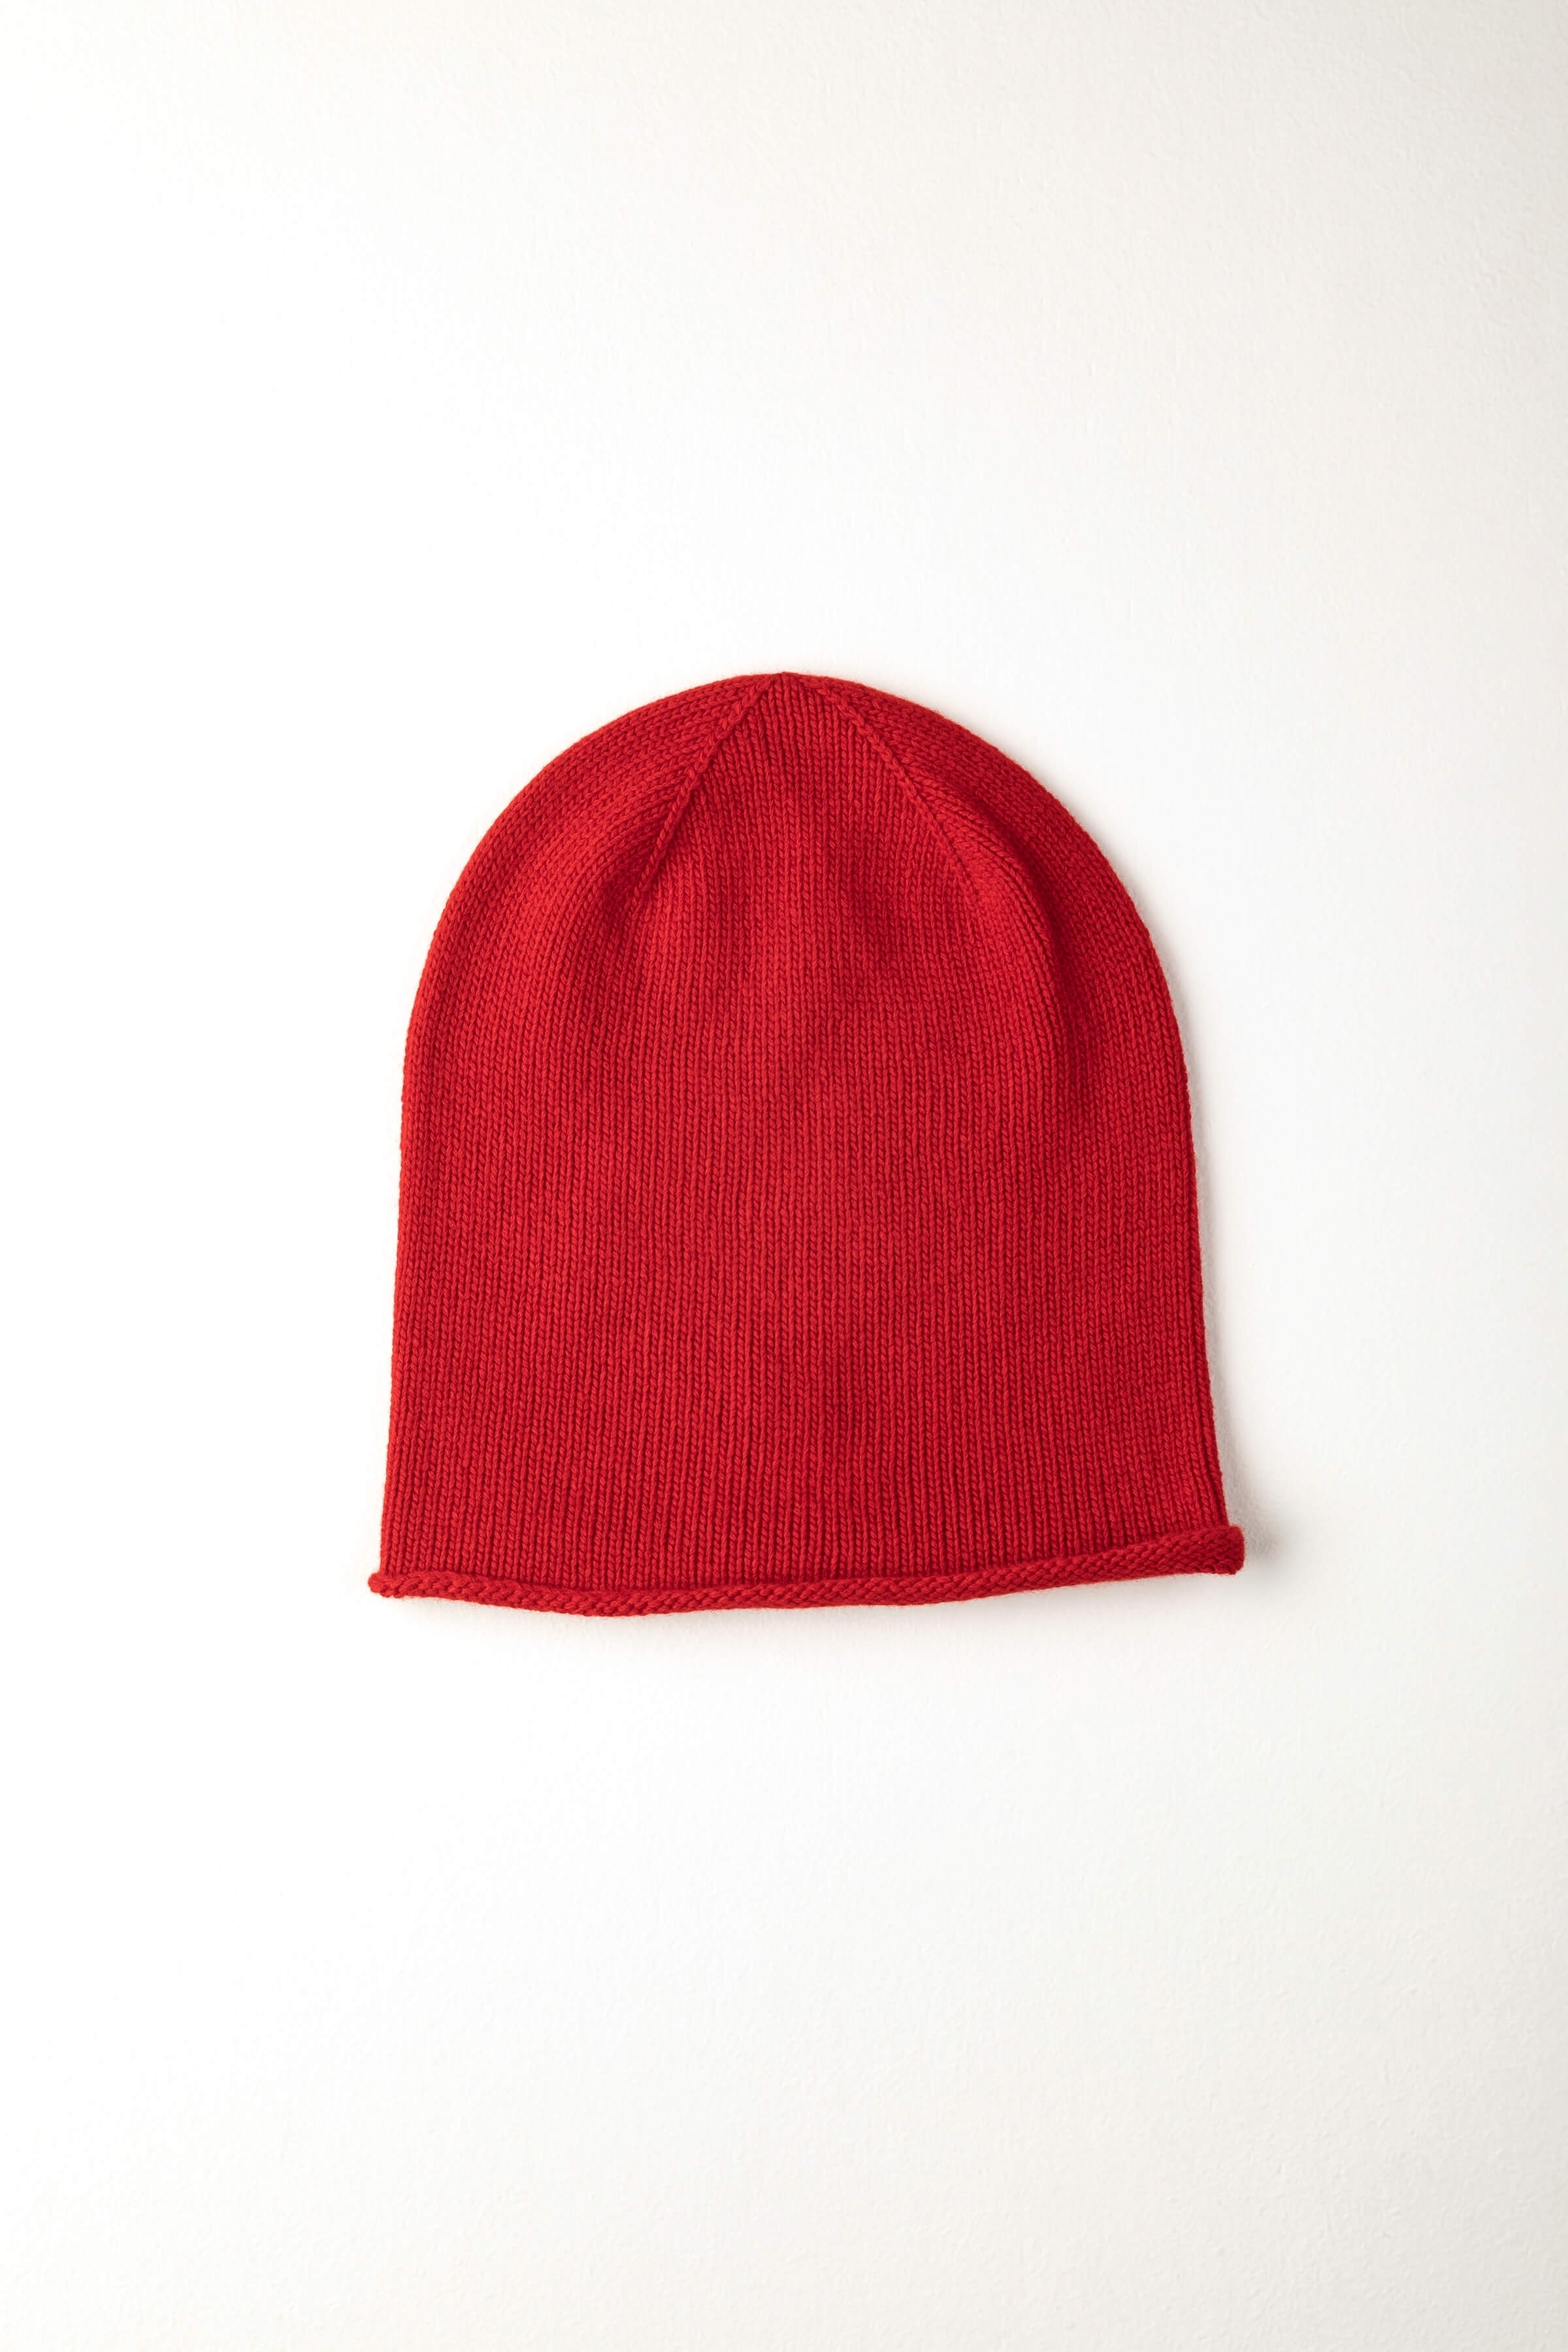 be3504bd124 Men s Designer Hats - Harvey Nichols